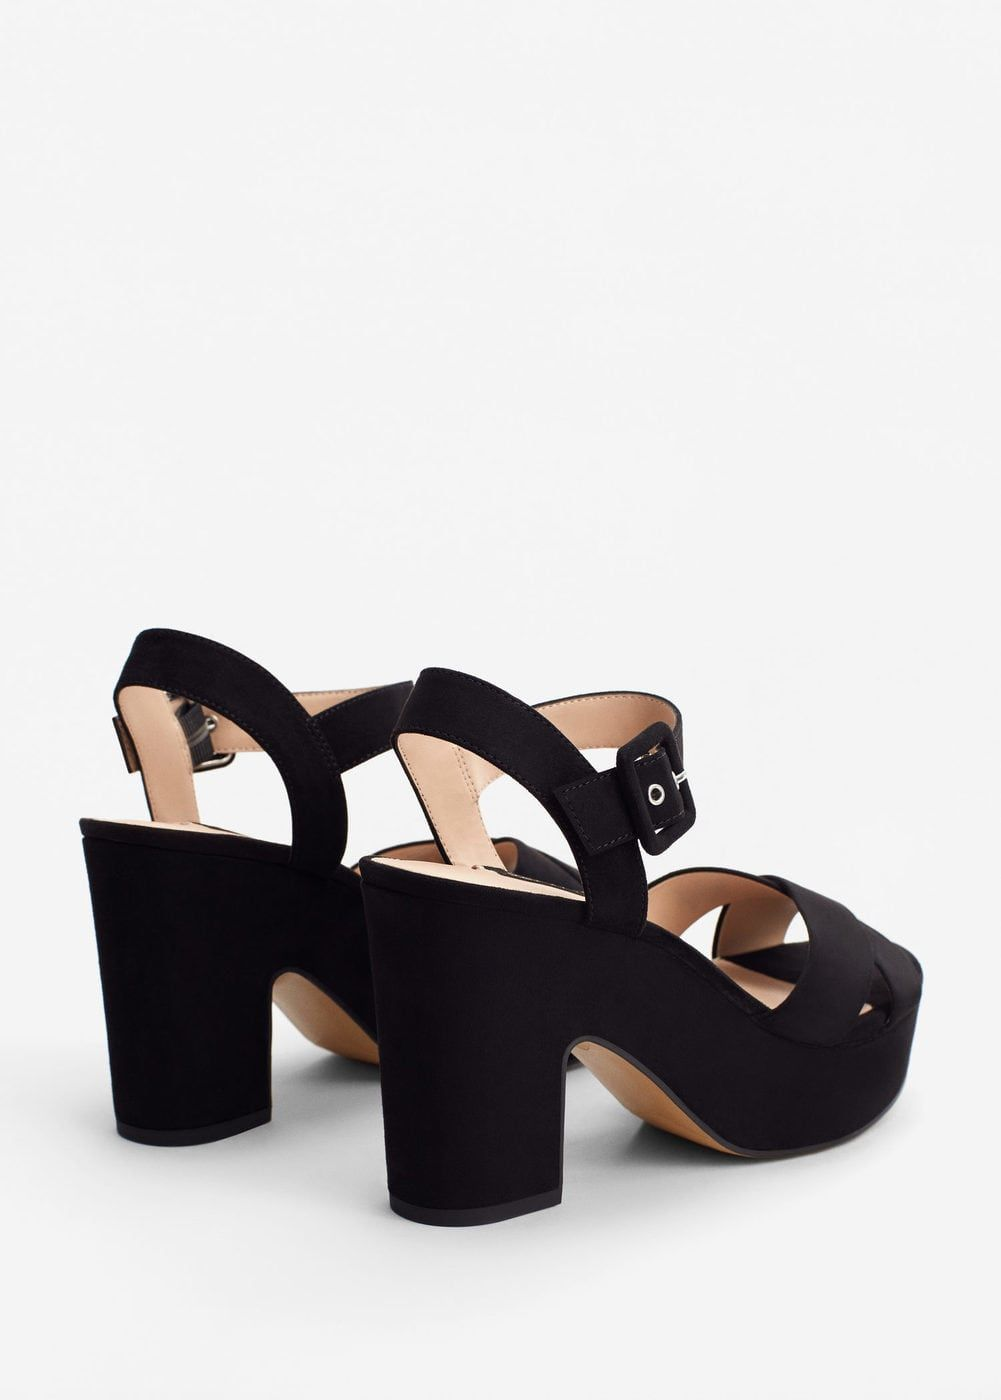 Plataforma Zapatos Sandalia Cruzada MujerMy Style De Tacón Jlu1cTK3F